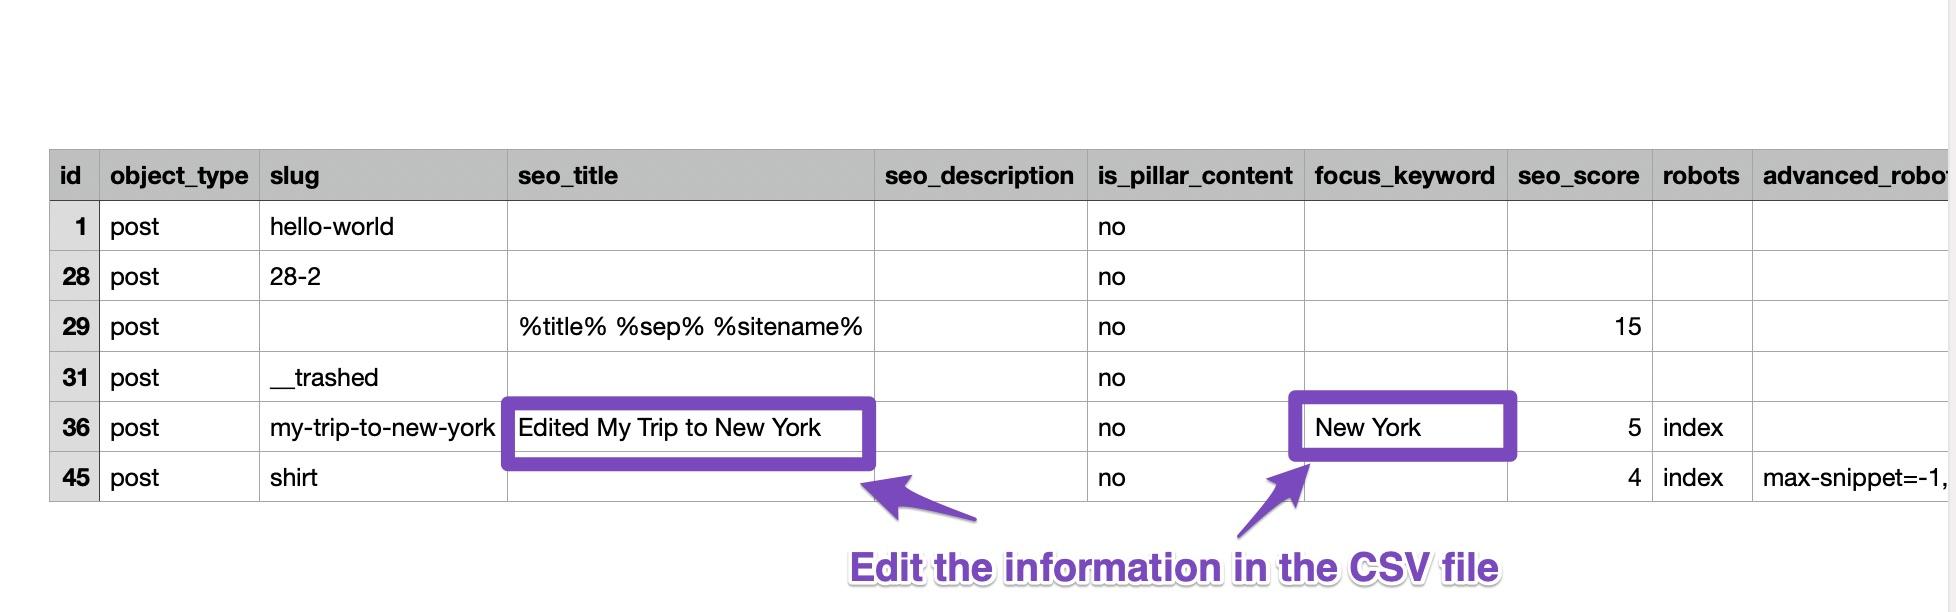 Edit Information in CSV File